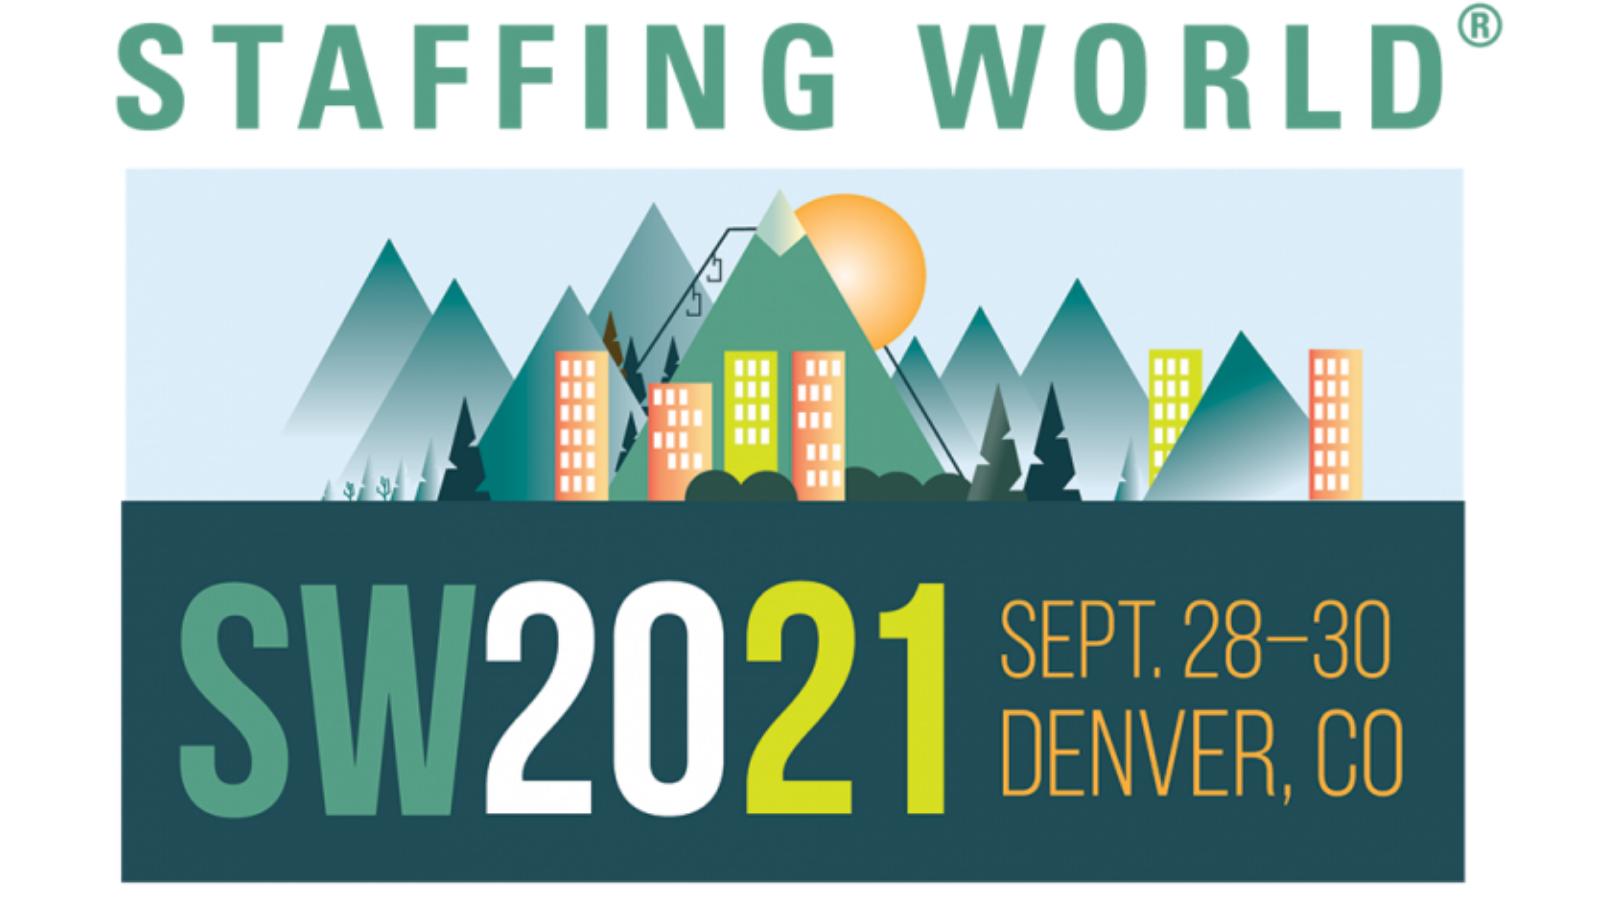 EVENT: Join us for Staffing World on September 28-30